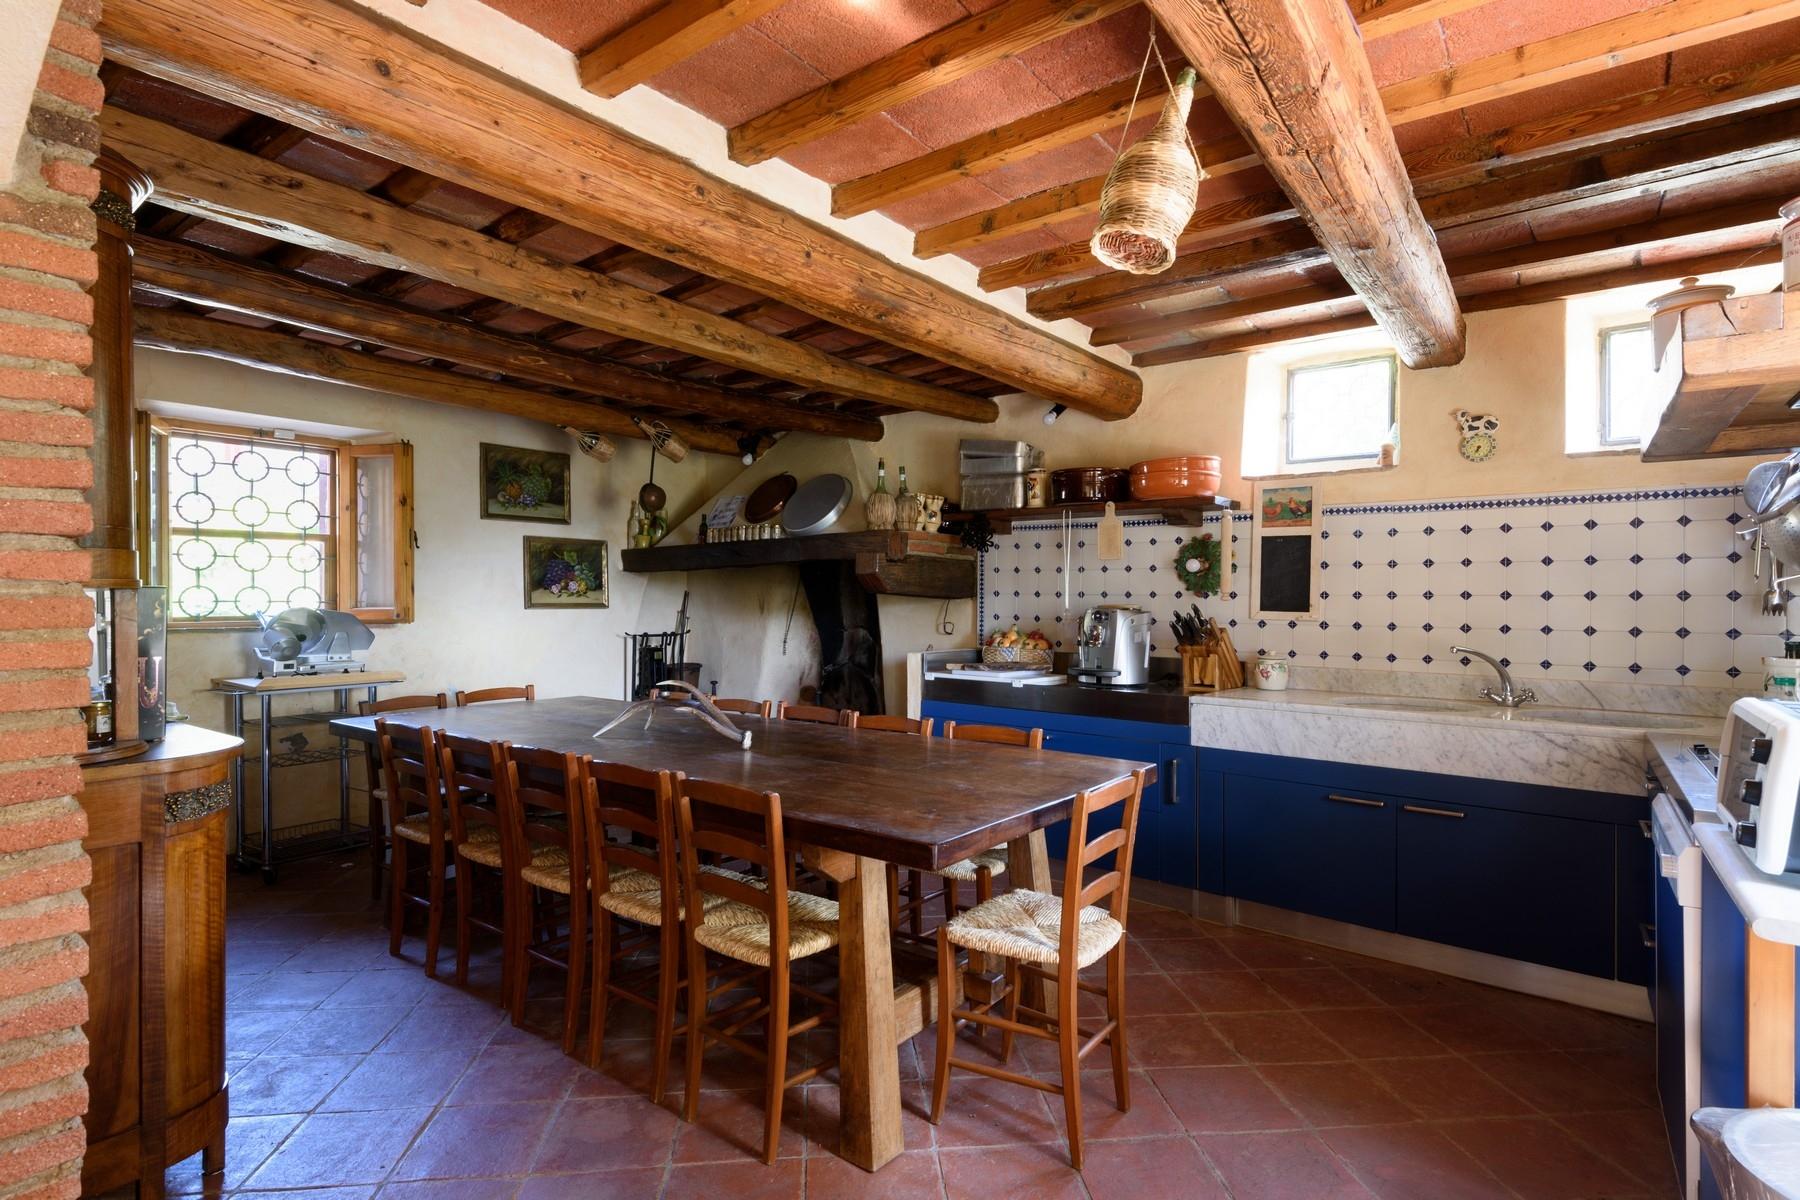 Villa in Vendita a Greve In Chianti: 5 locali, 491 mq - Foto 11